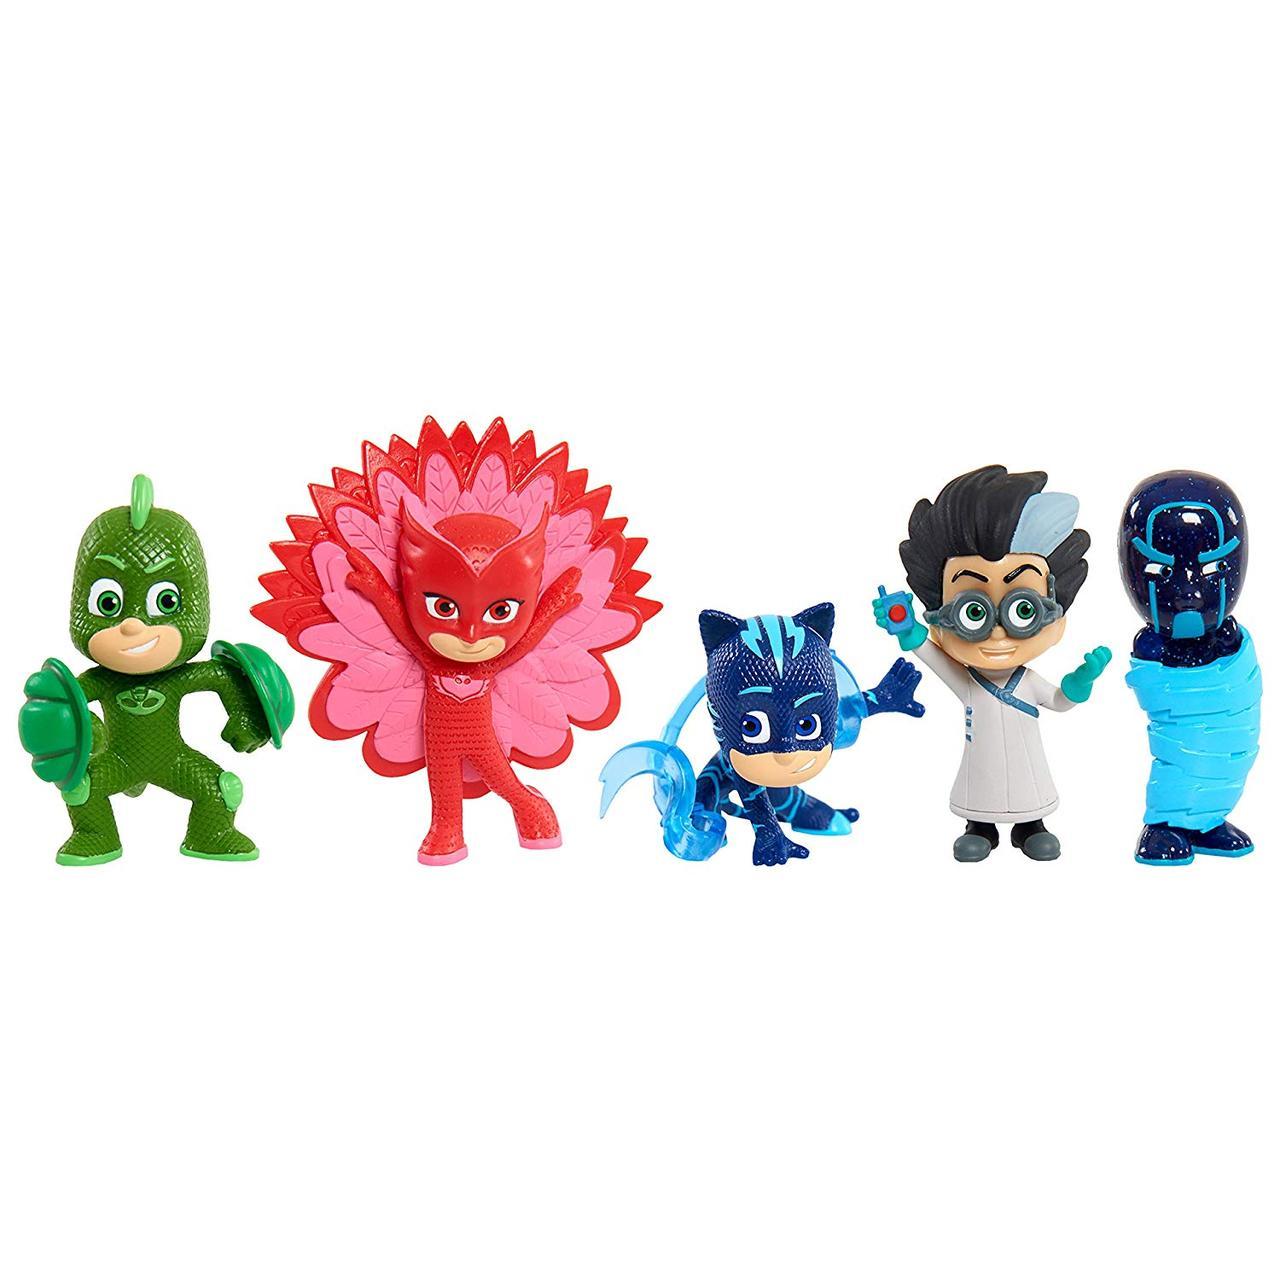 Набор Герои в масках Оригинал PJ Masks Collectible Figures Set Power up poses (5 фигурок)